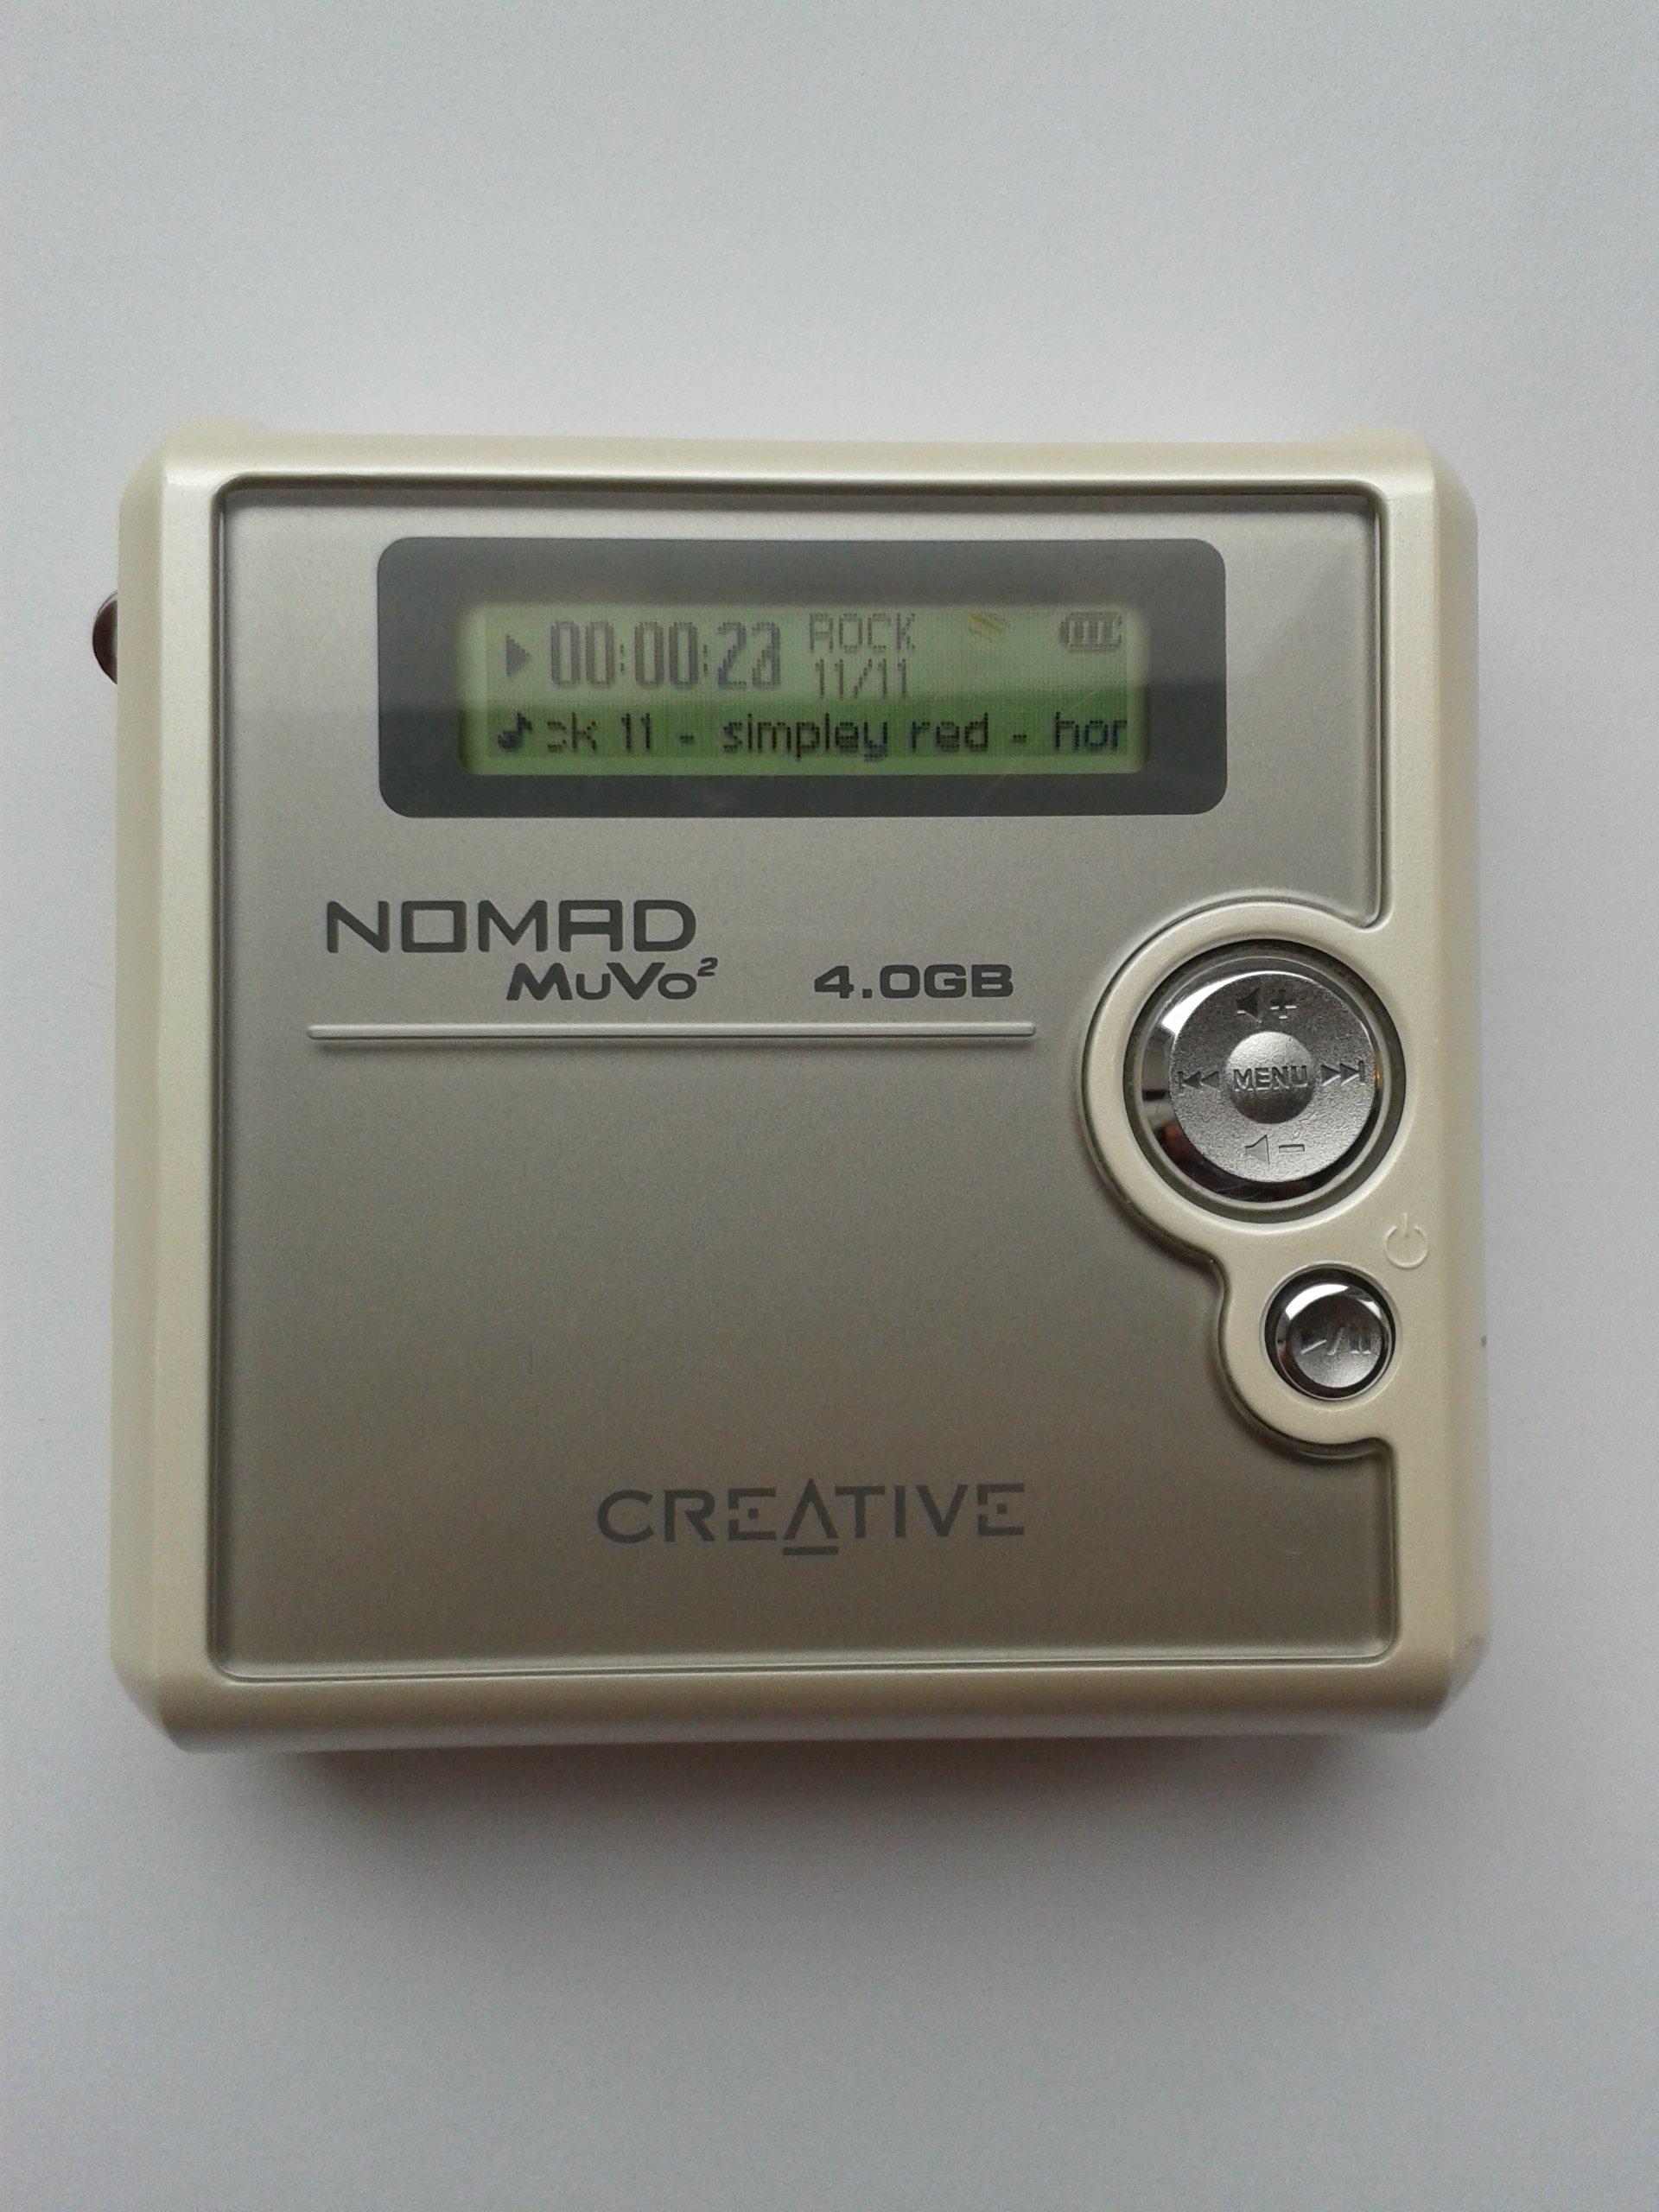 CREATIVE NOMAD MUVO2 4GB DRIVER